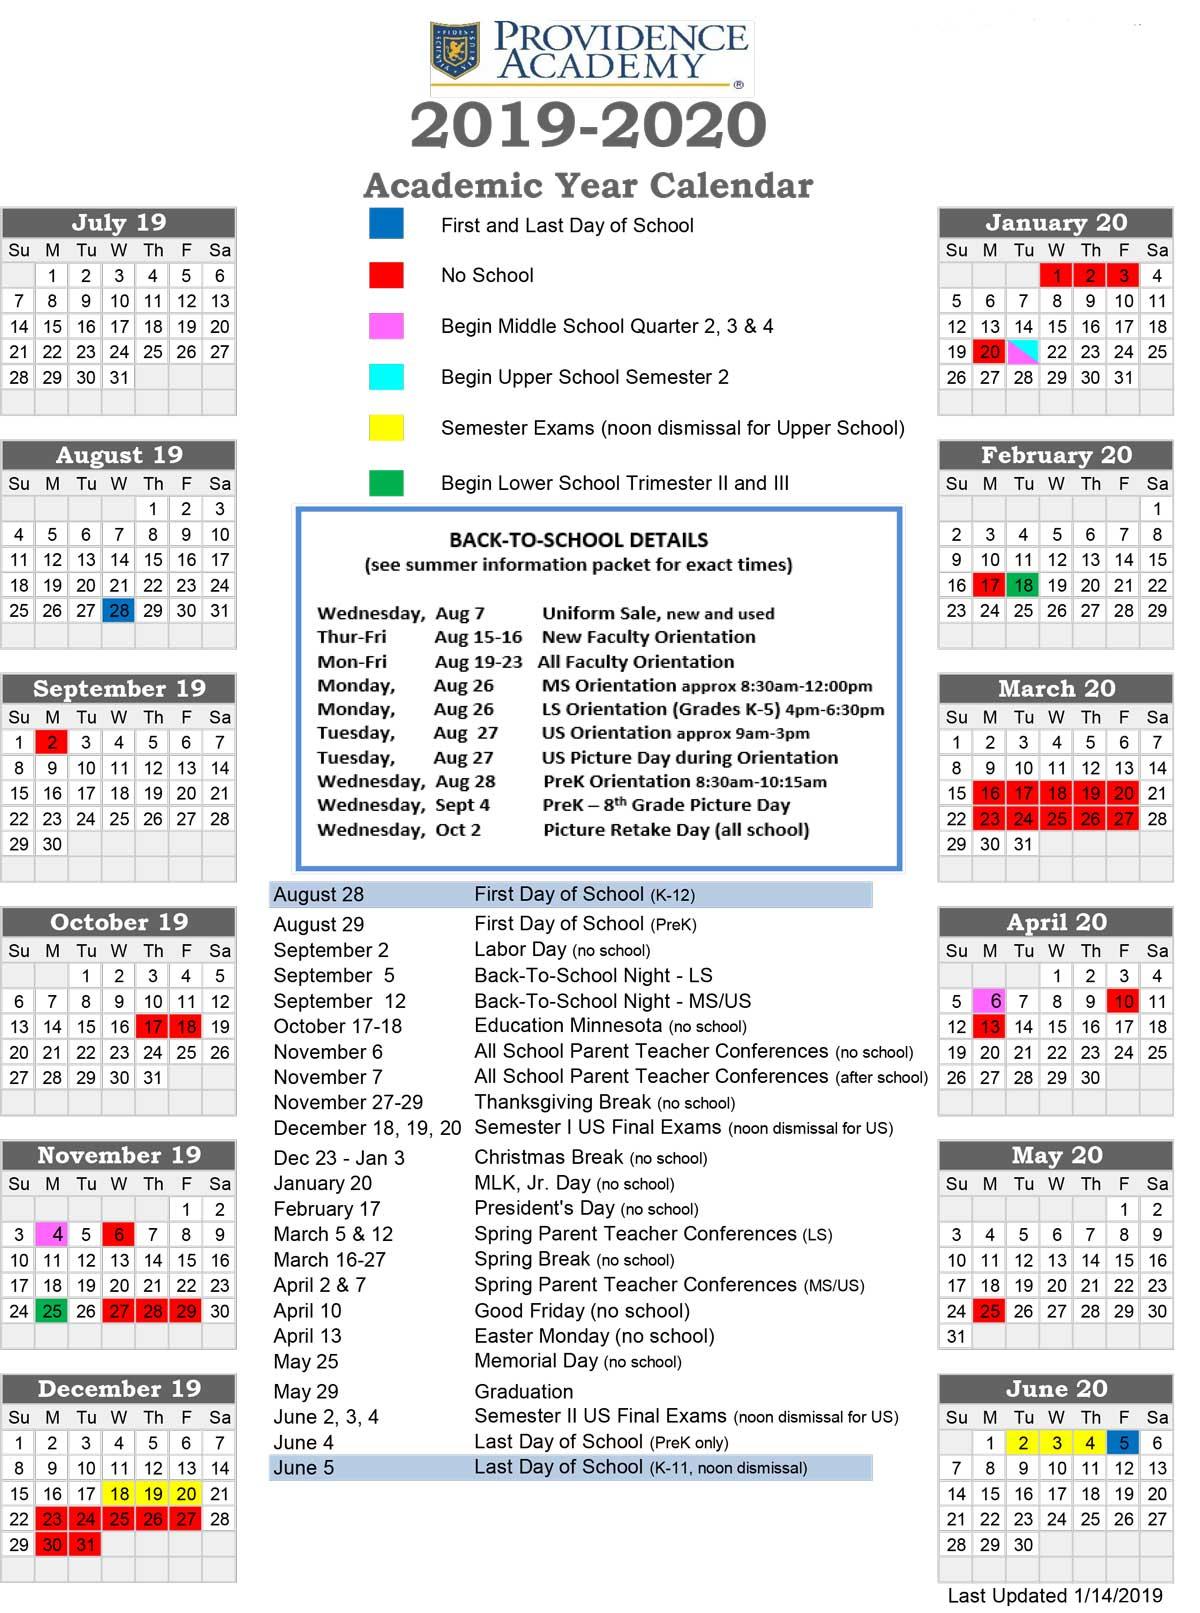 Academic Calendar - Providence Academy regarding Eden Prairie High School Calendar 2021